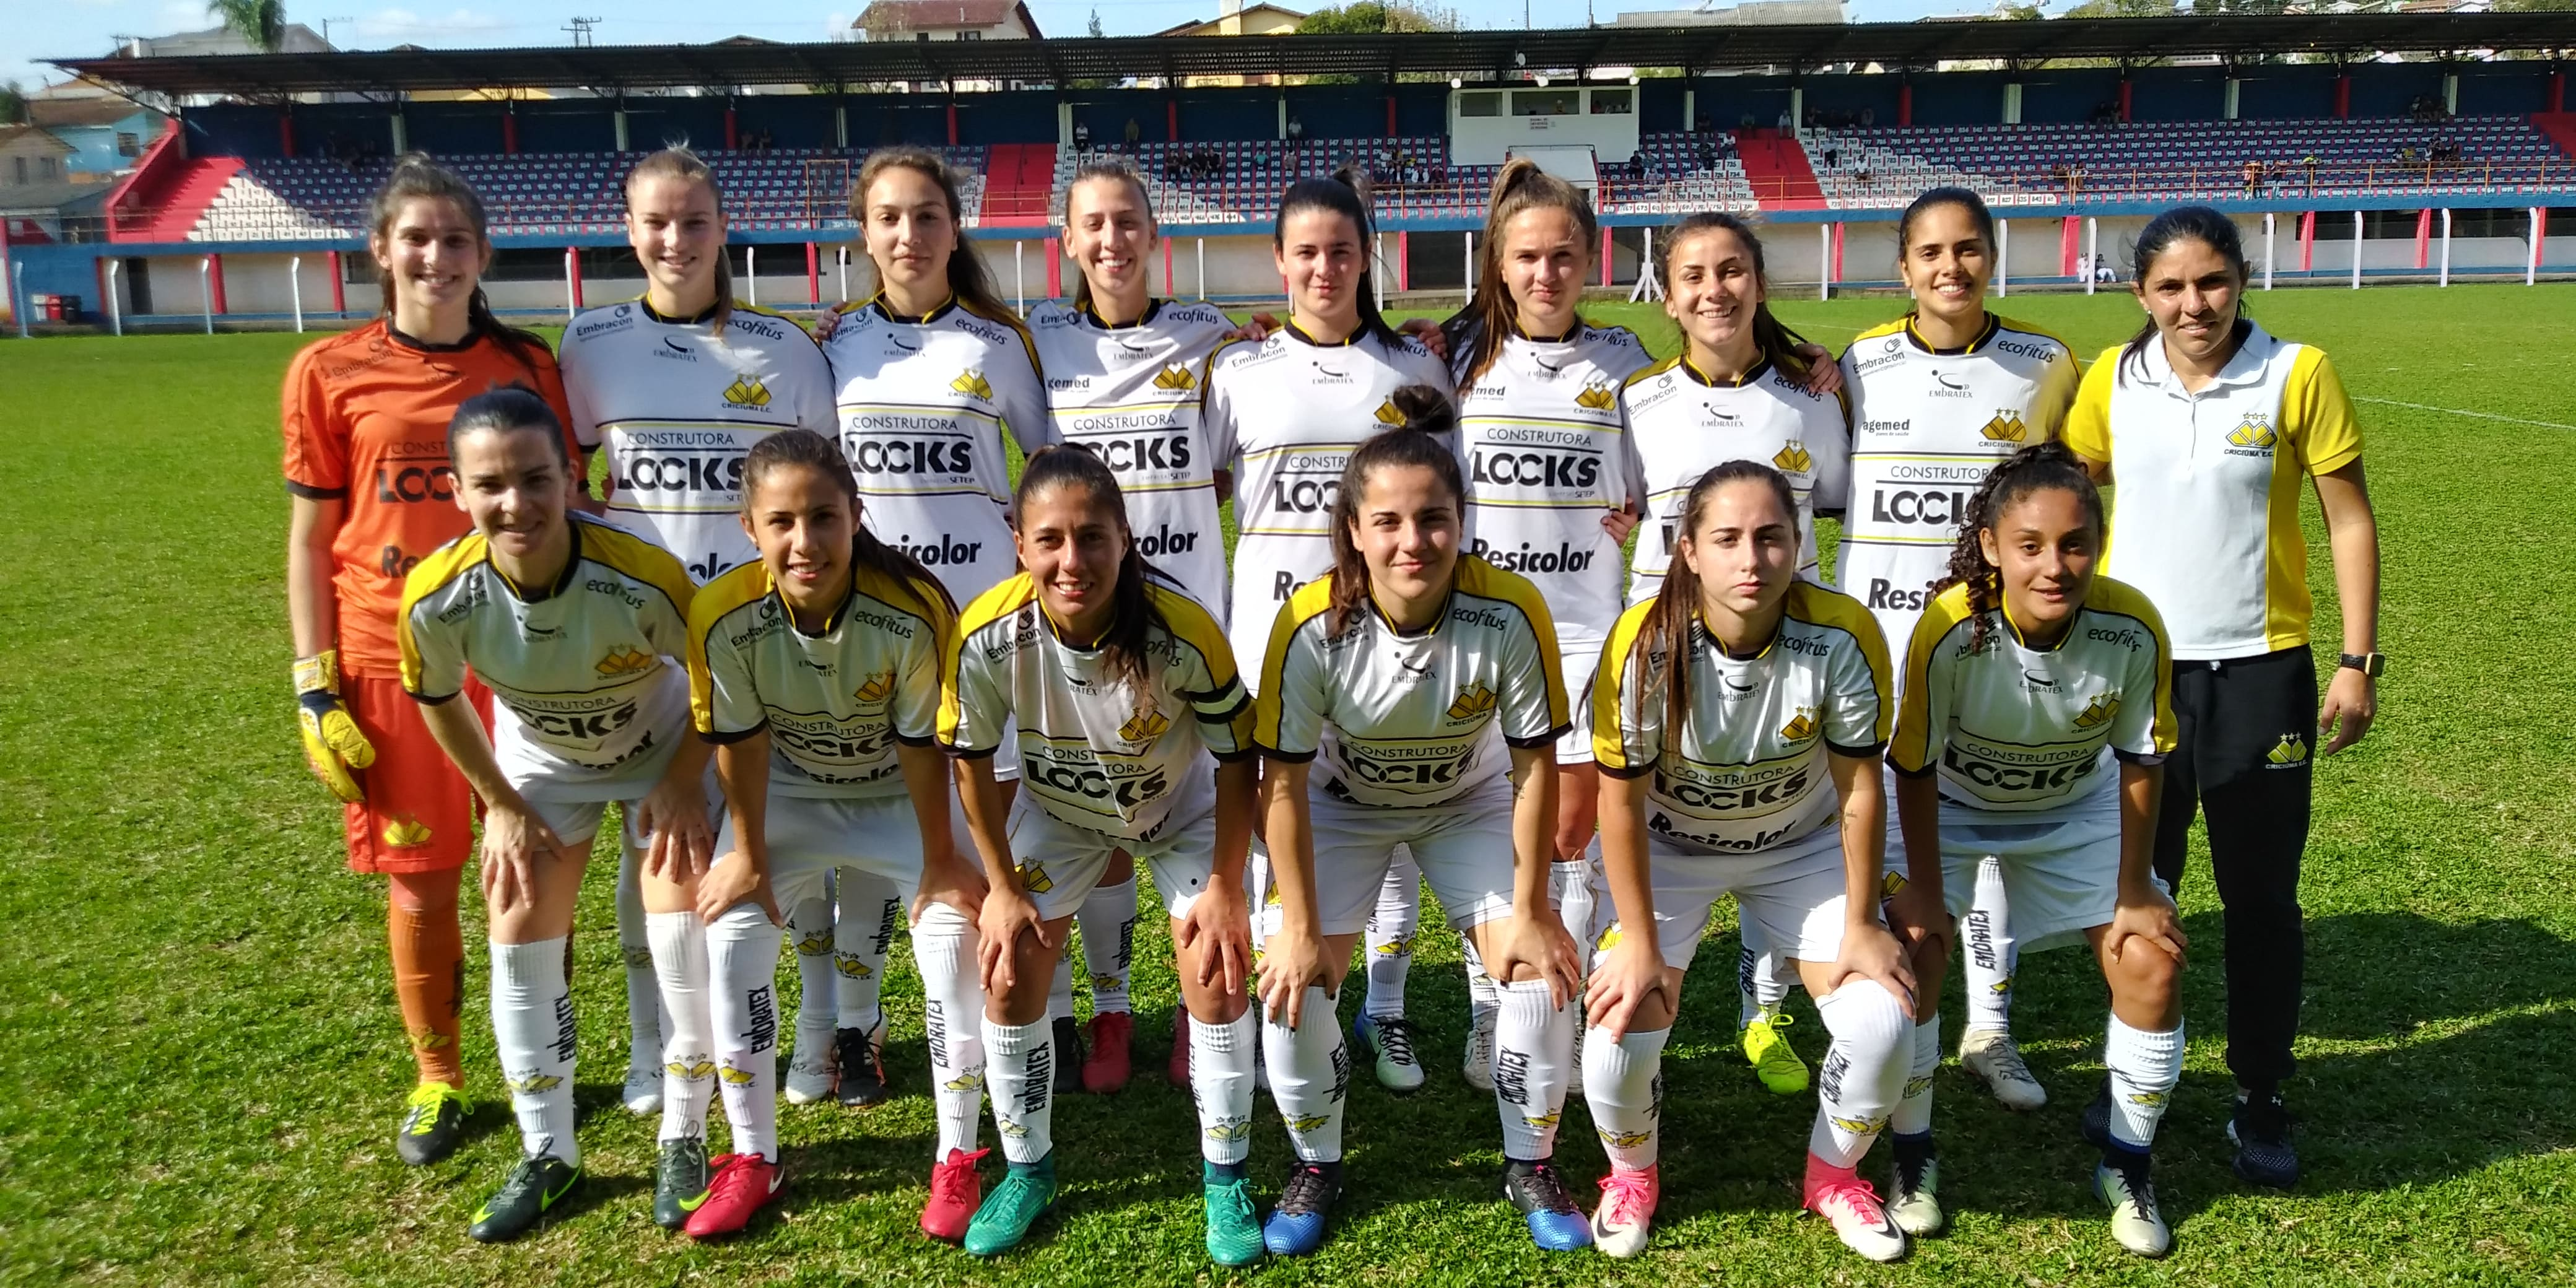 Handebol de Criciúma disputa Campeonato Estadual nesta quarta-feira